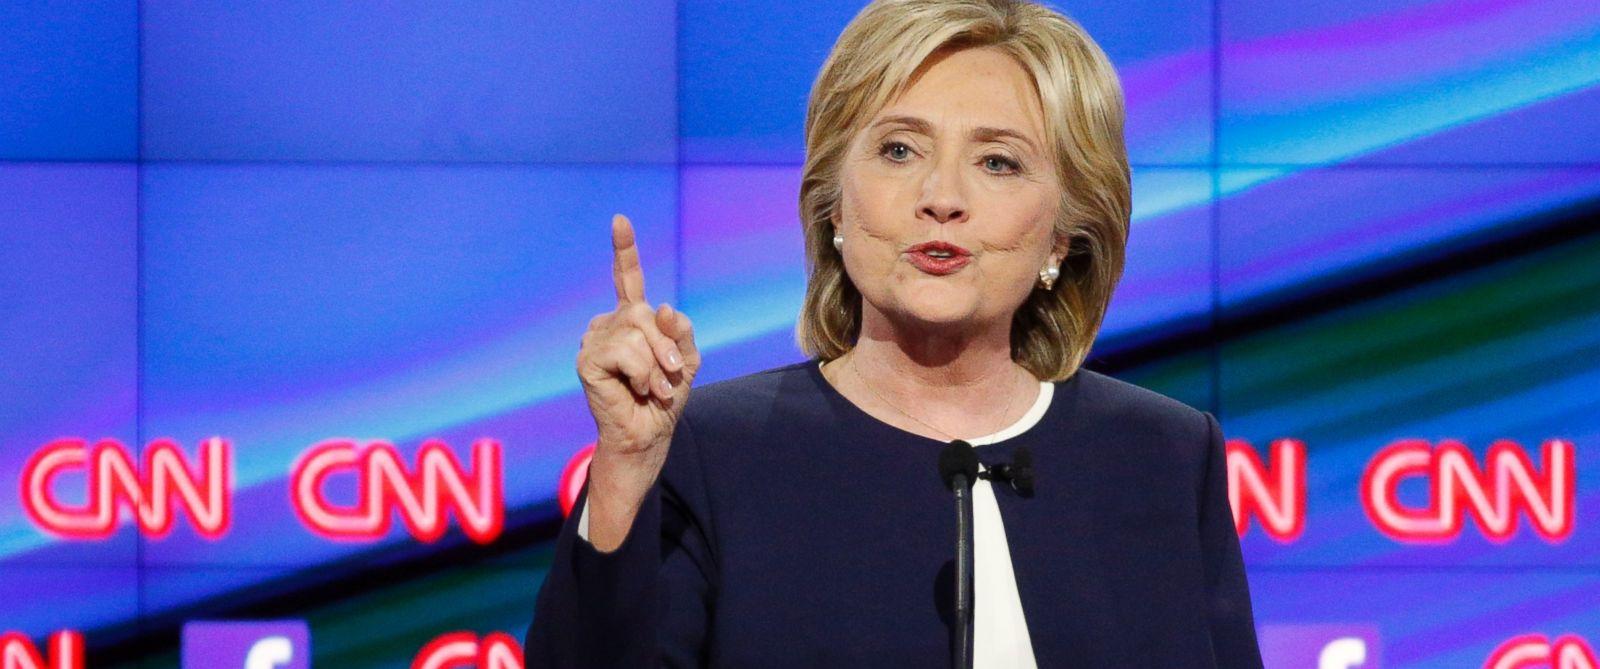 PHOTO: Hillary Rodham Clinton speaks during the CNN Democratic presidential debate, Oct. 13, 2015, in Las Vegas.